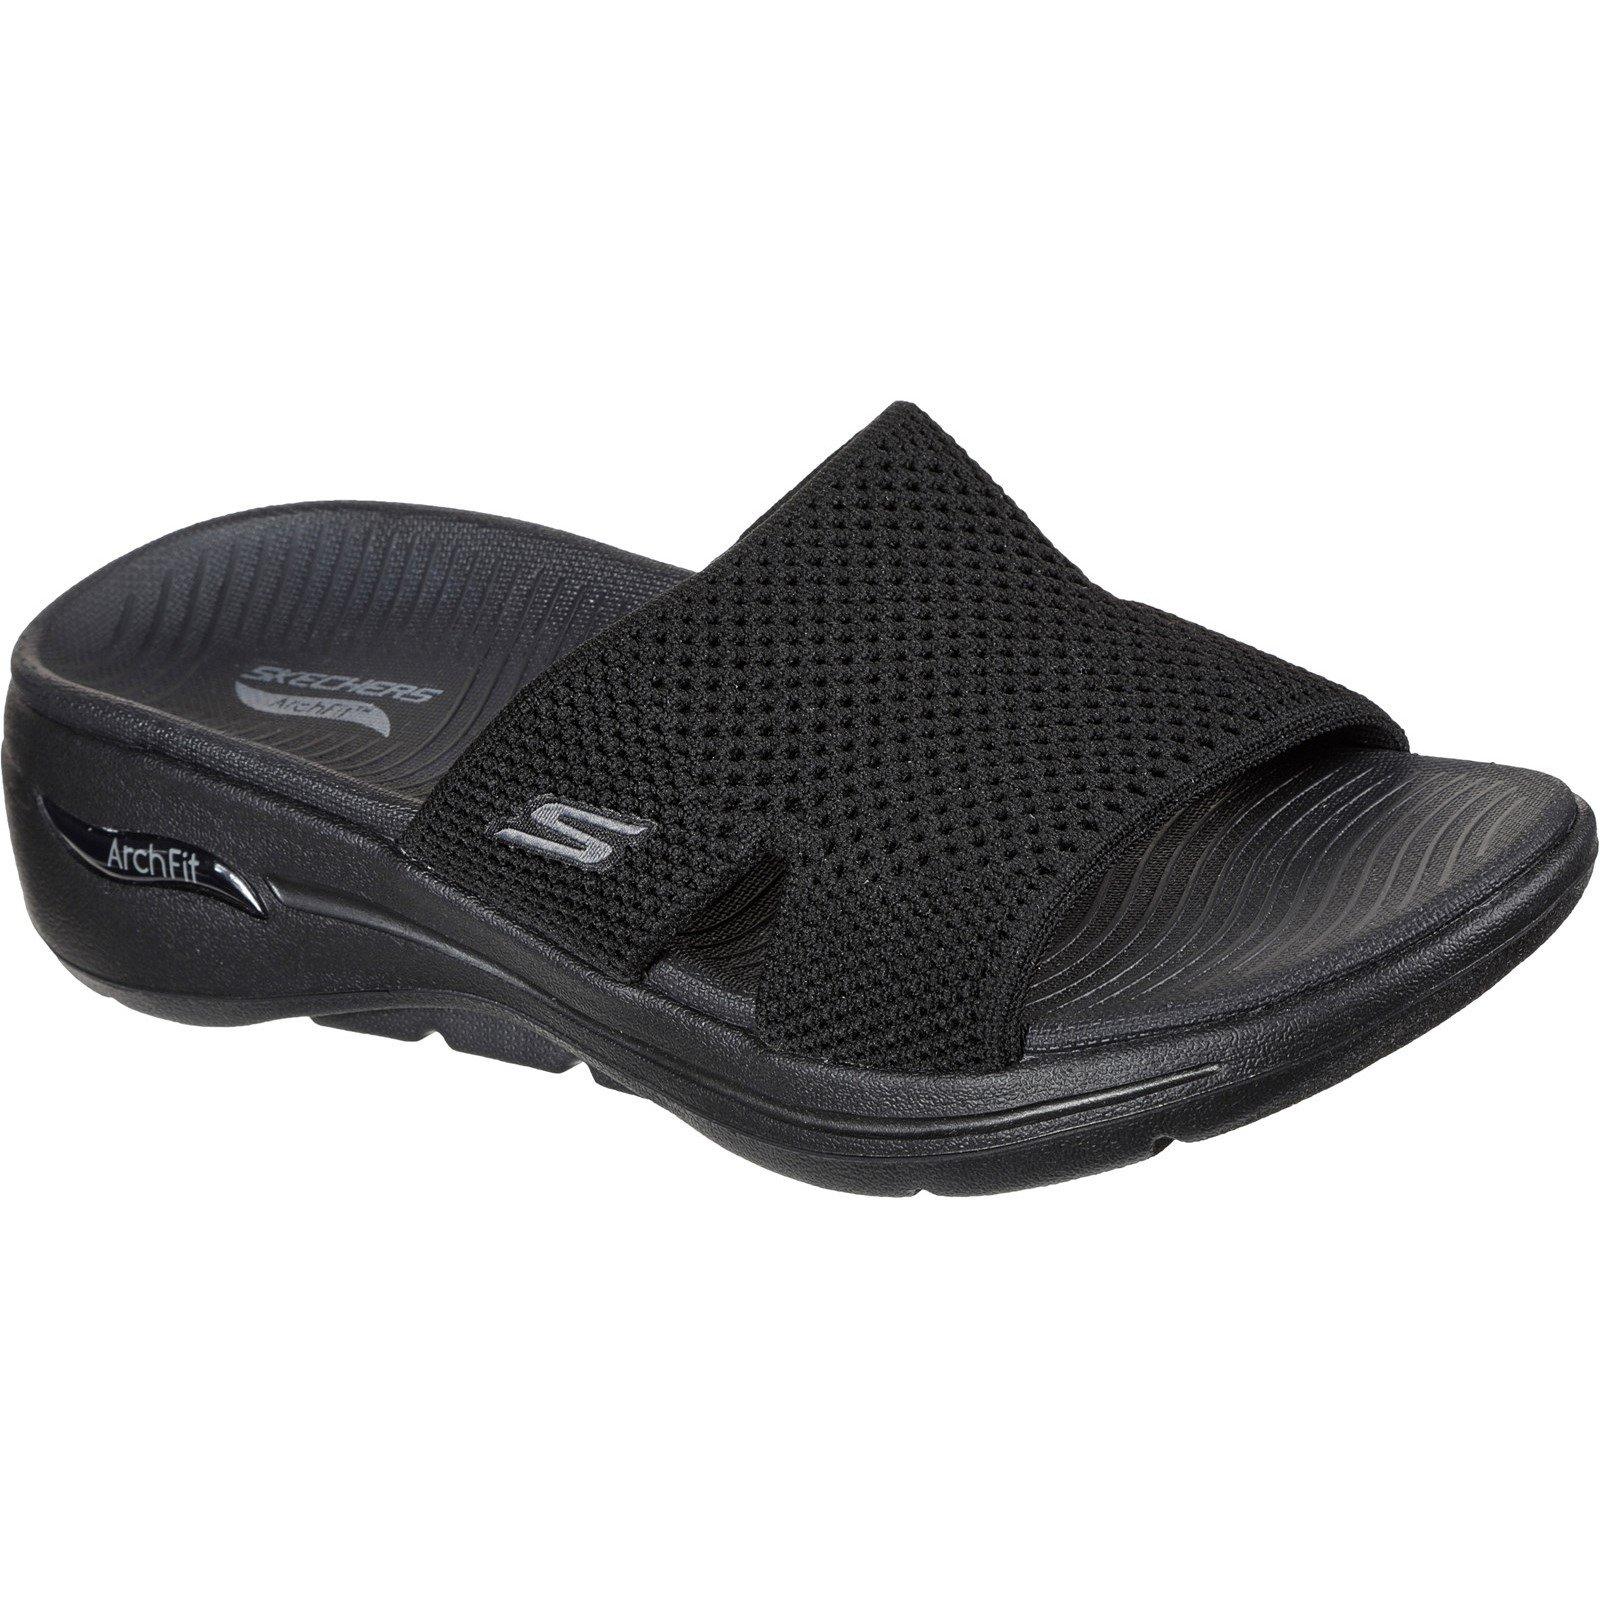 Skechers Women's Go Walk Arch Fit Worthy Summer Sandal Various Colours 32152 - Black 3